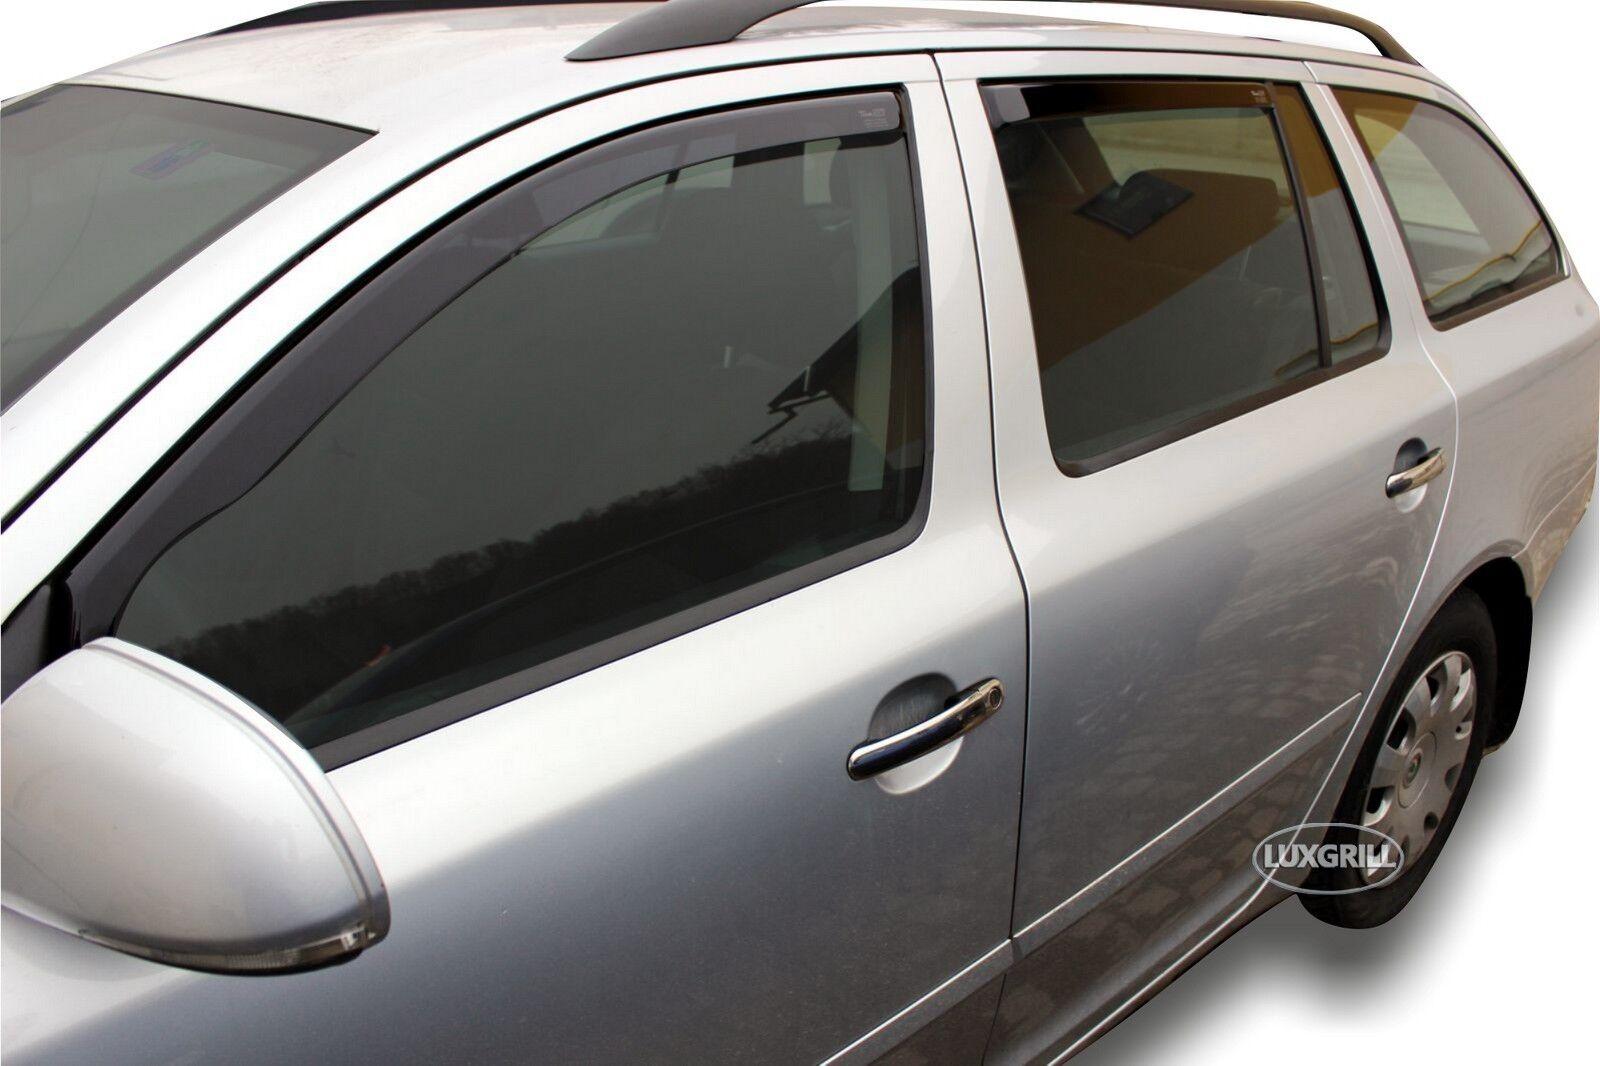 Satz Car Shades kompatibel mit Skoda SuperB 5 t/ürer 2008-2015